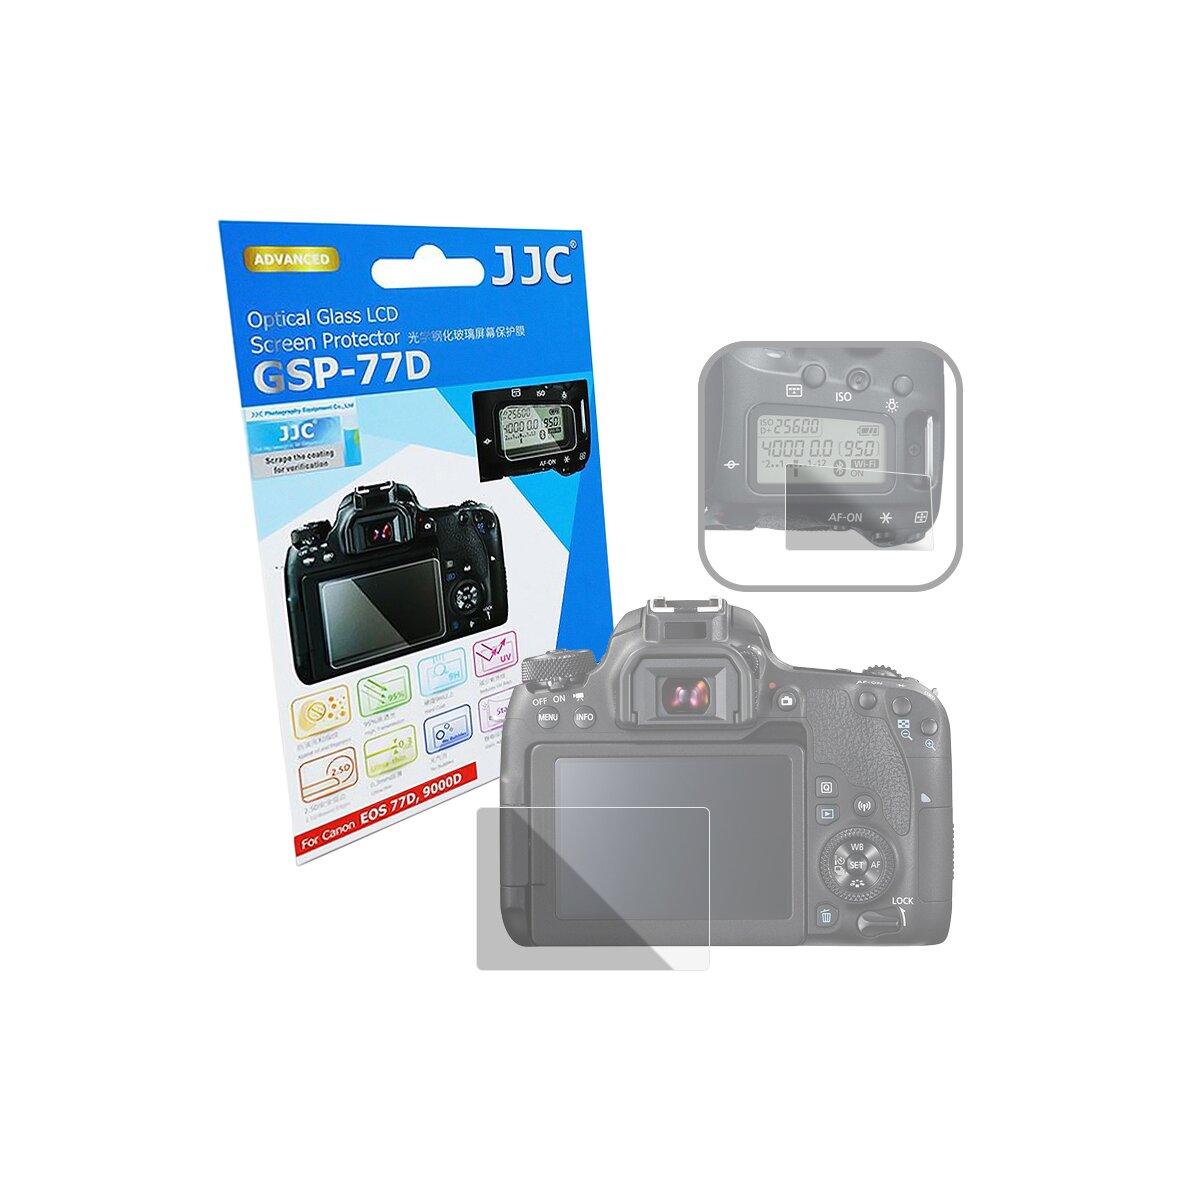 JJC GSP-77D Hochwertiger Displayschutz Screen Protector aus gehärtetem Echtglas kompatibel mit Canon EOS M77D, 9000D